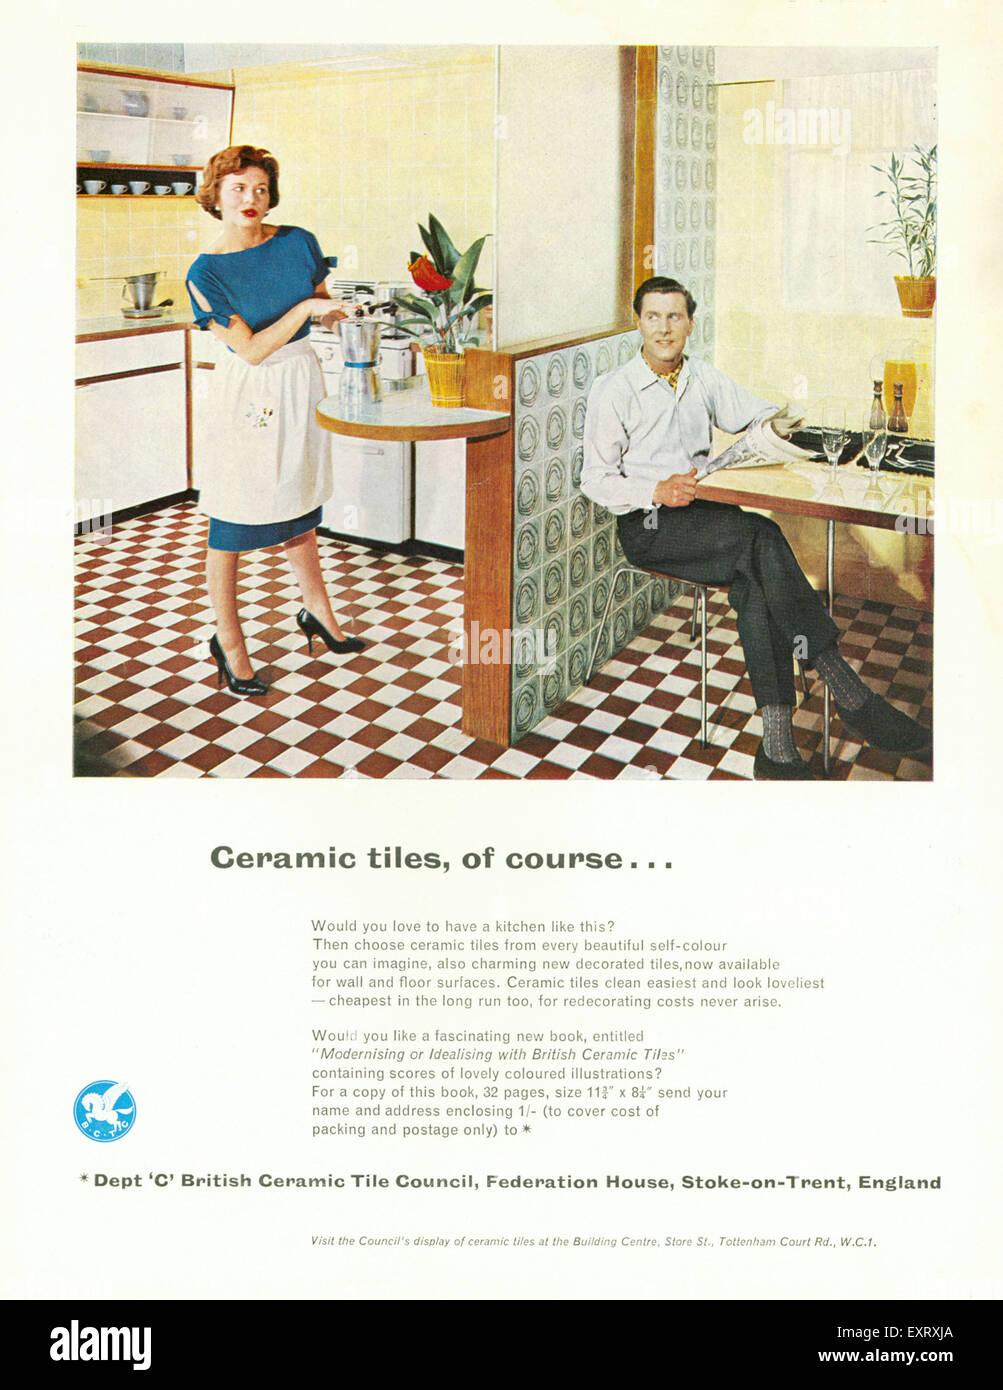 1960s uk kitchens magazine advert stock photos 1960s uk kitchens 1960s uk british ceramic tiles magazine advert stock image dailygadgetfo Choice Image